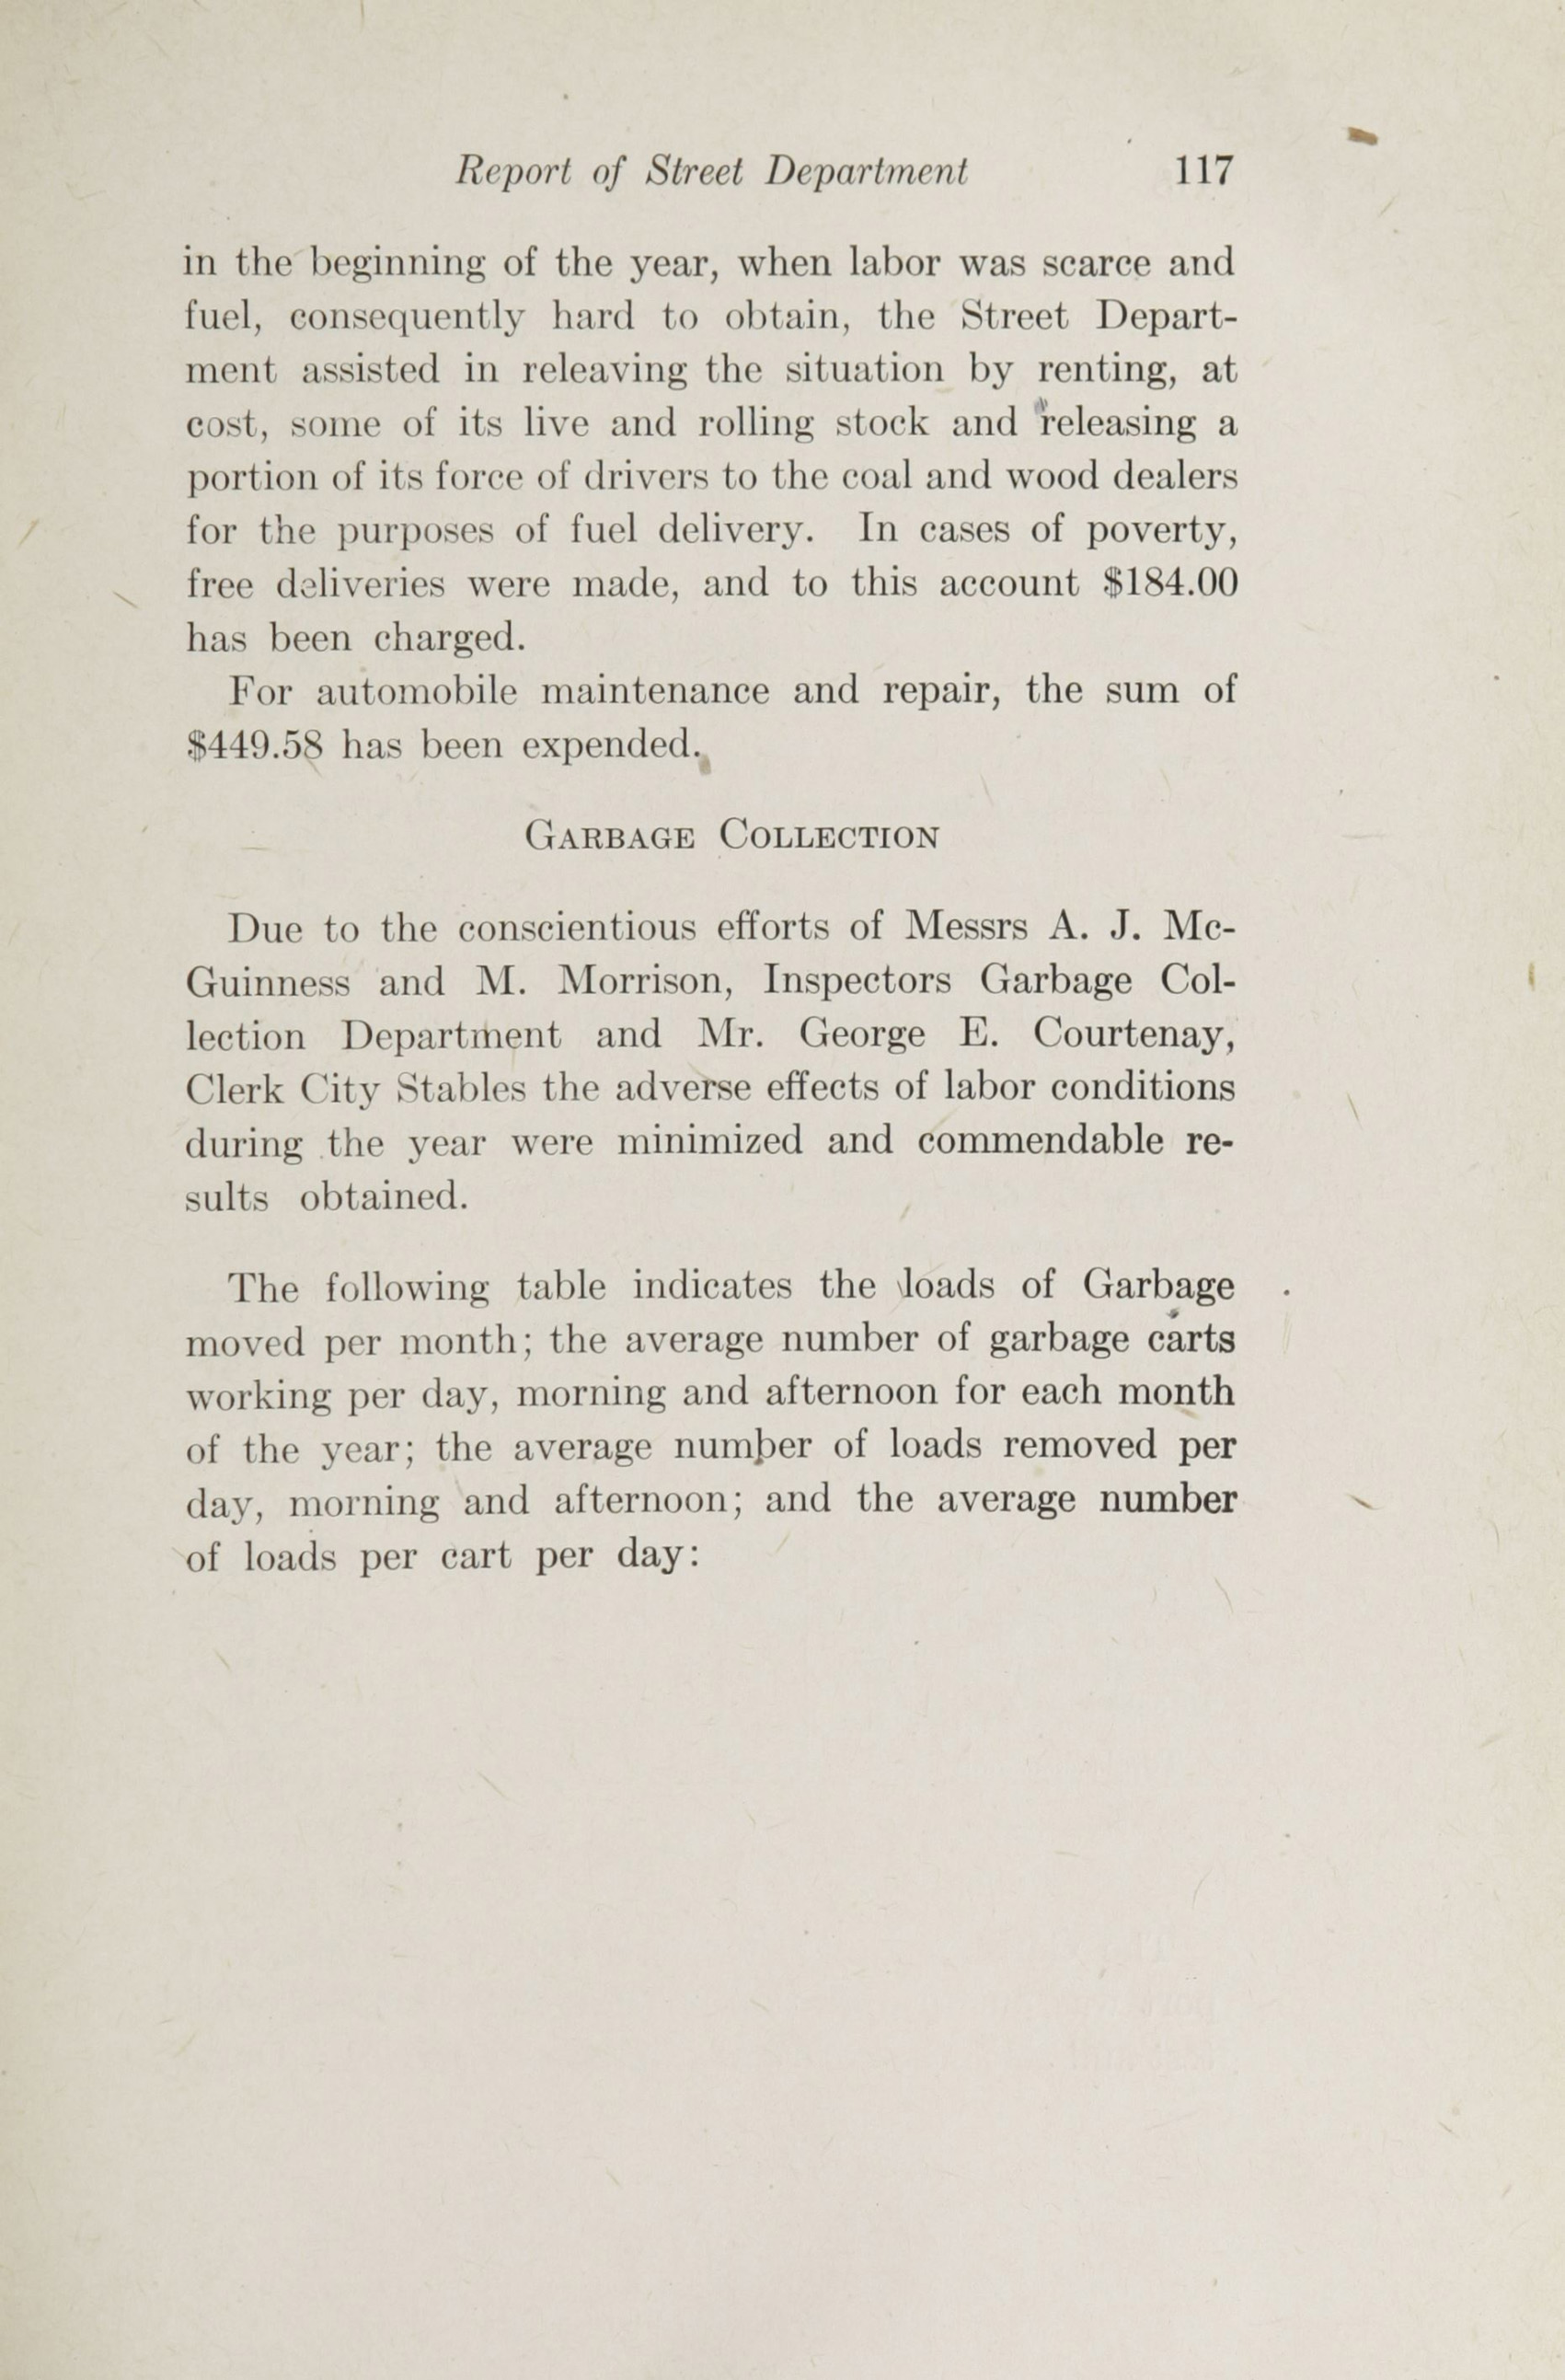 Charleston Yearbook, 1918, page 117